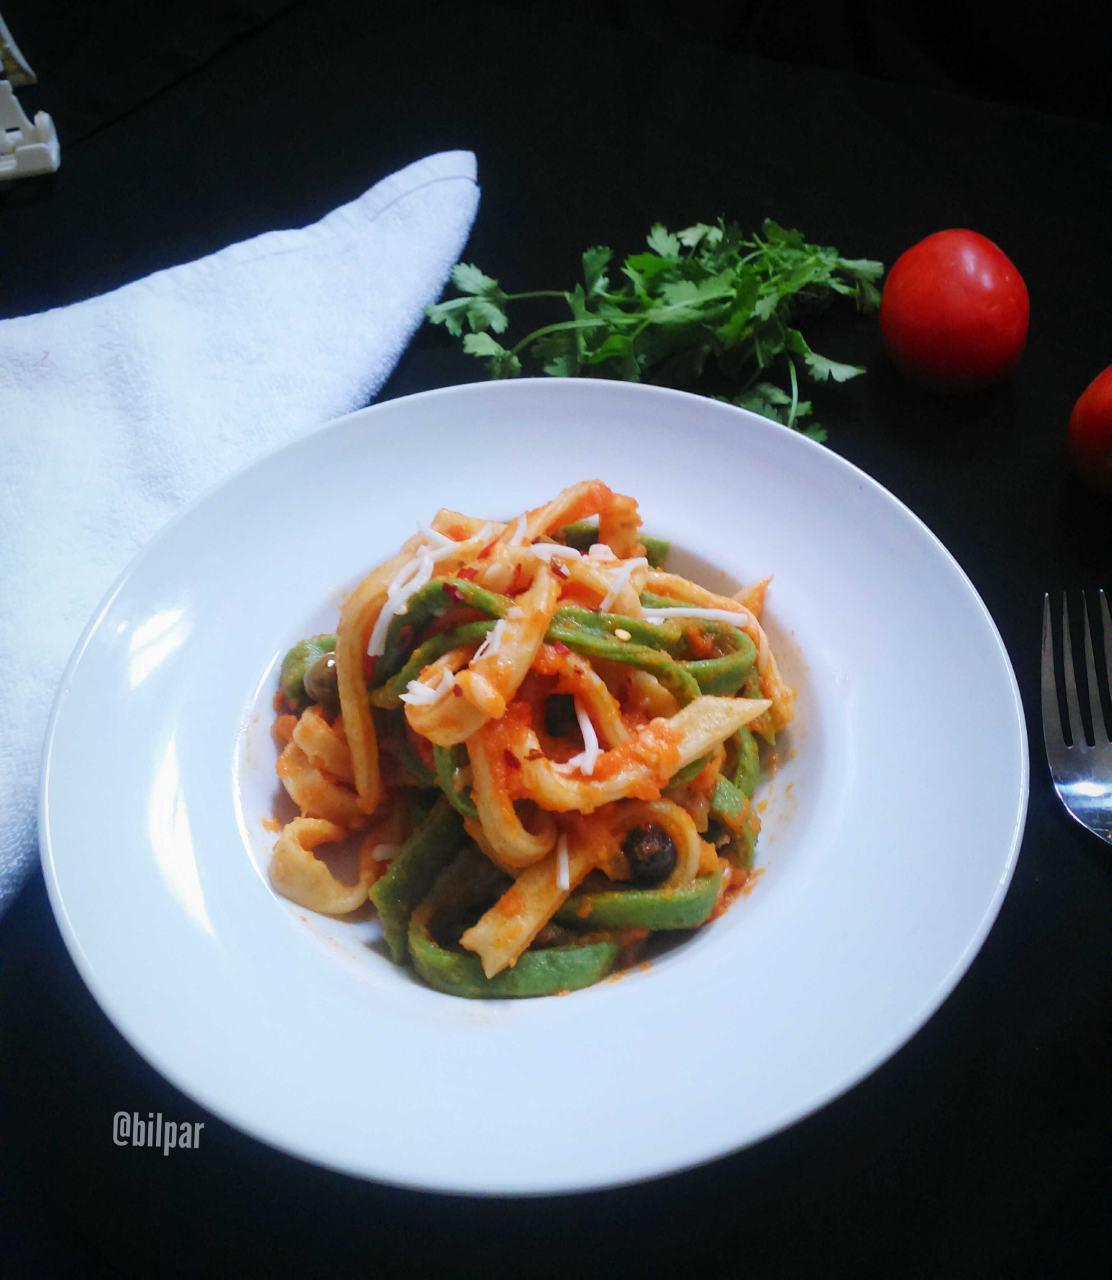 Colourful Homemade Pasta